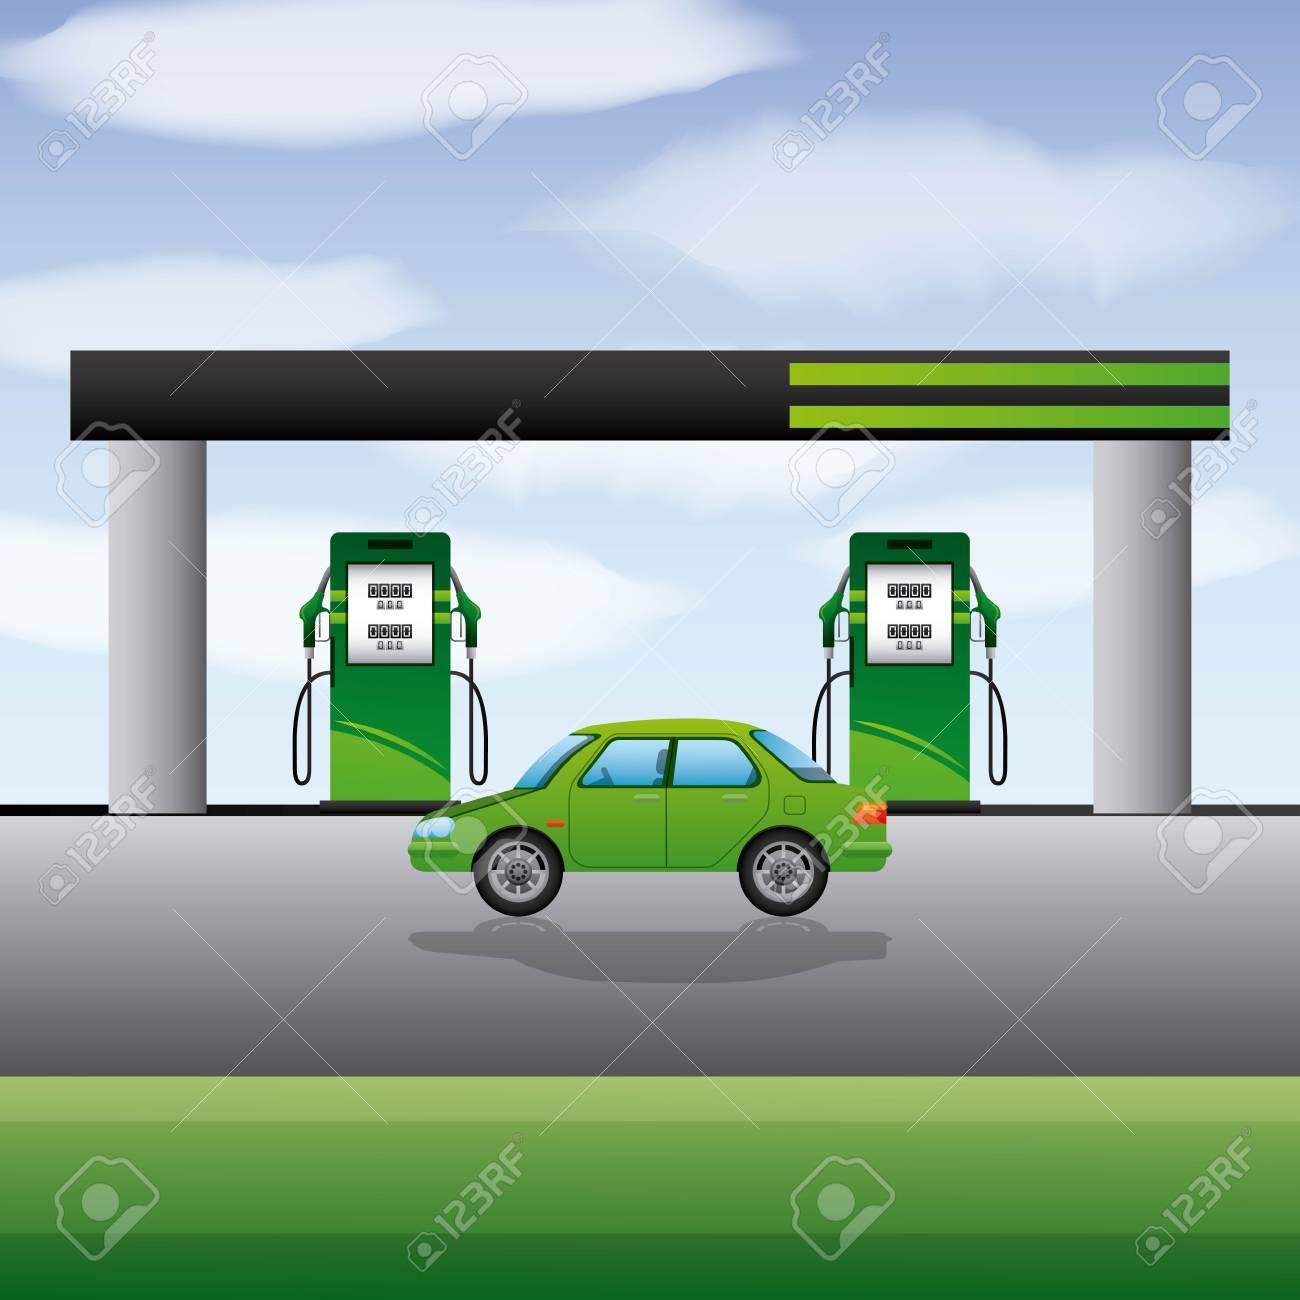 Station gasoline car transport biofuel vector illustration - 96902864